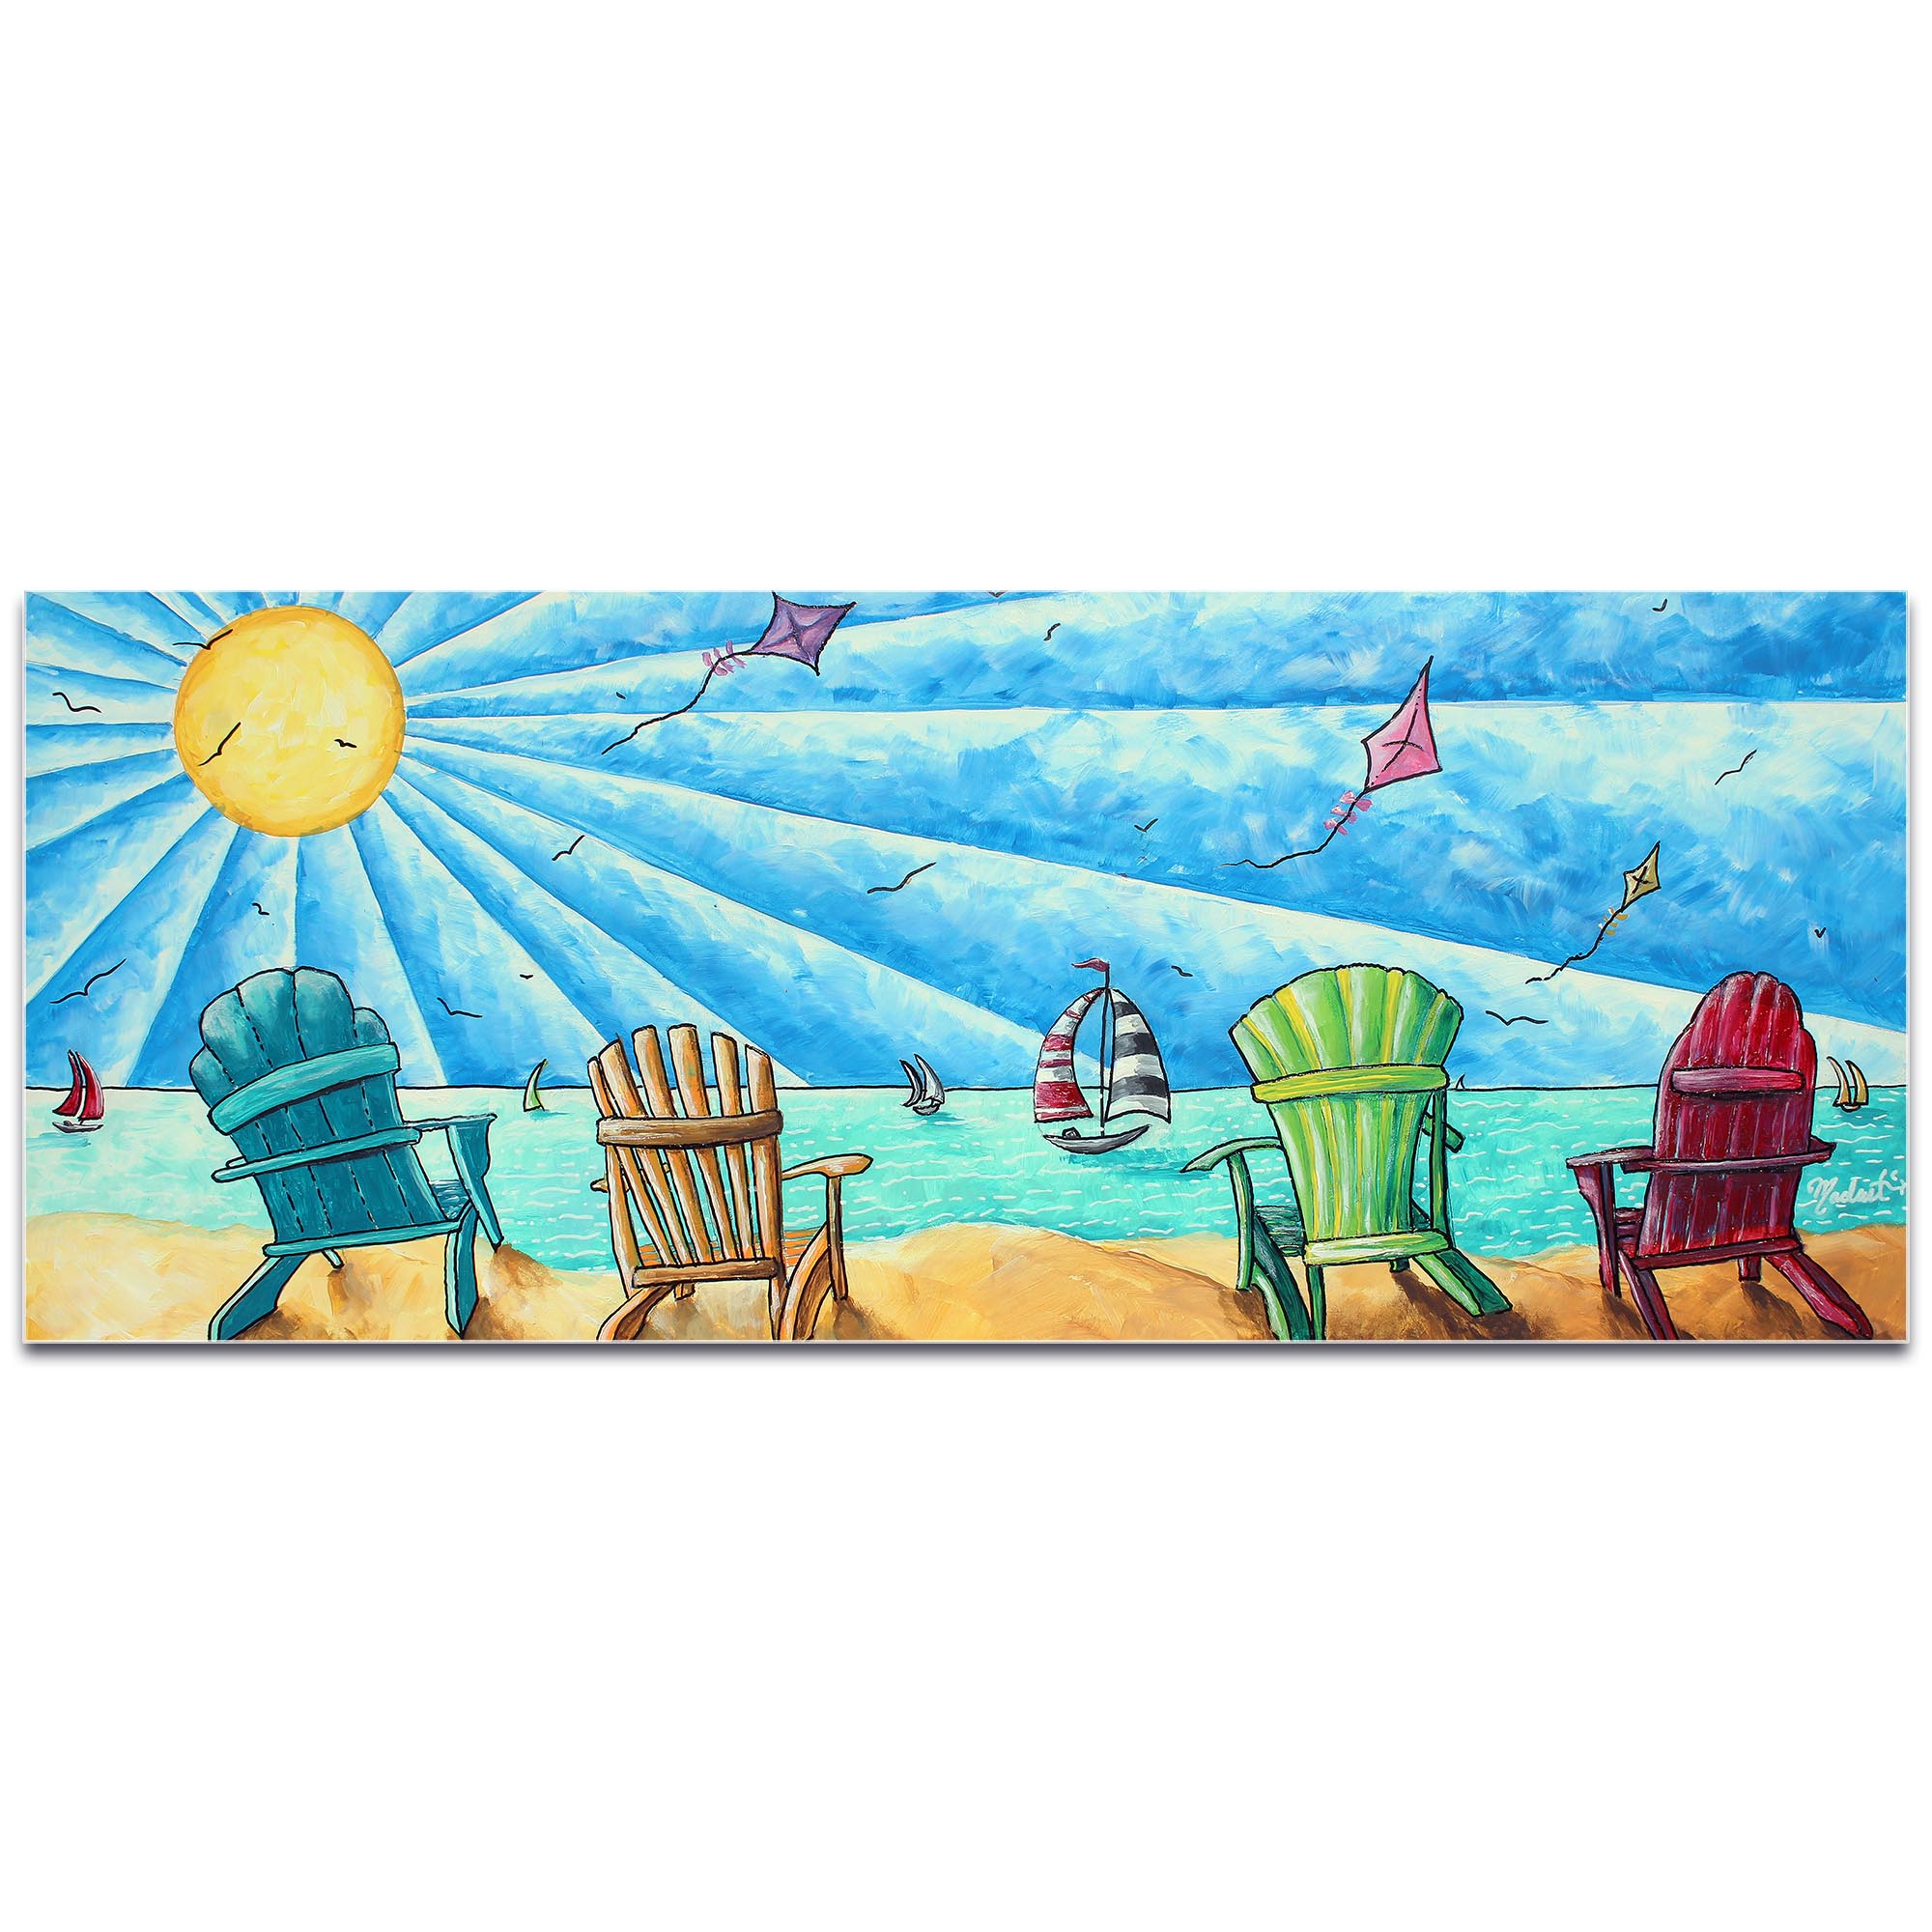 Beach Painting 'Beach Life v1' - Tropical Wall Art on Metal or Acrylic - Image 2